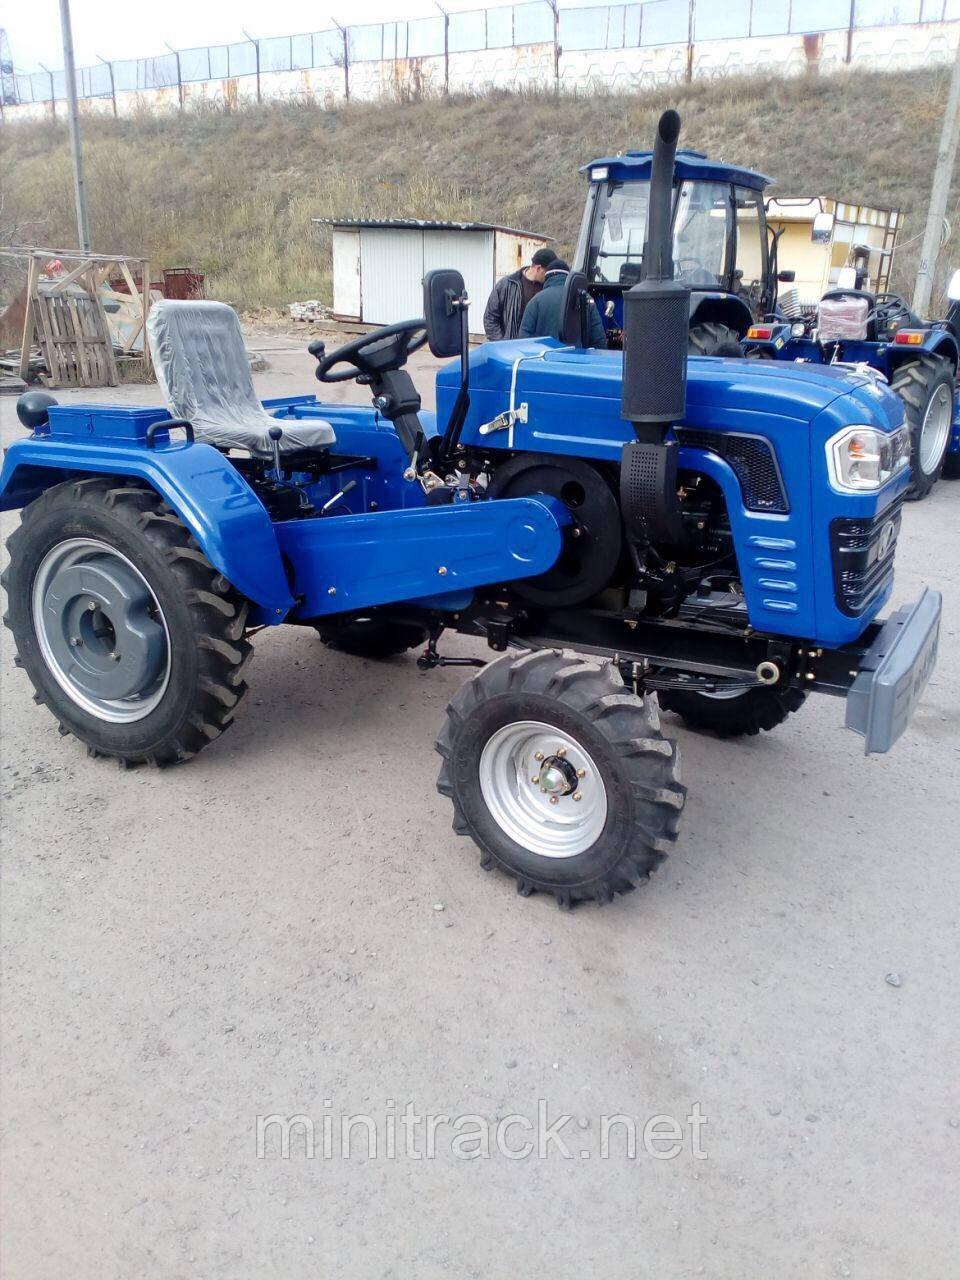 Трактор, DW 240 B, (24 лс, 4х2, 3цил., 1-е сц., блок. диф.)